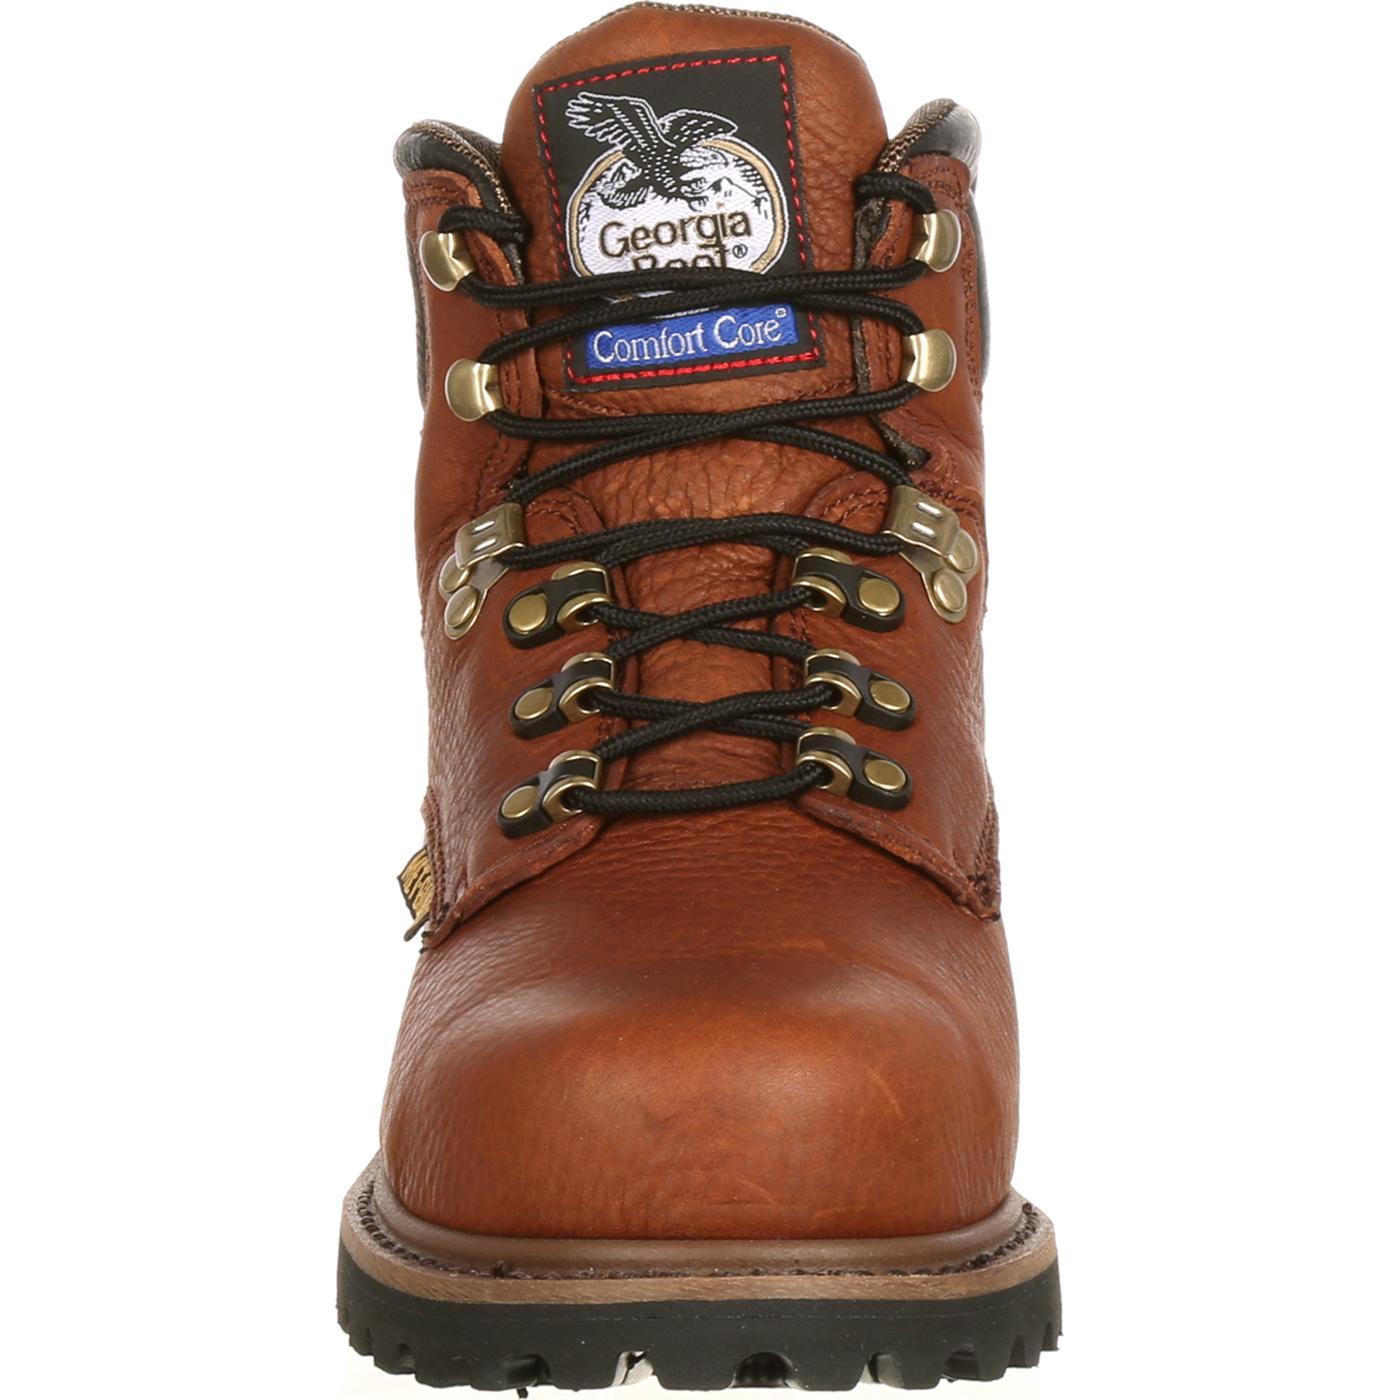 4e5398103f Georgia Internal Met Guard Steel Toe Work Boots